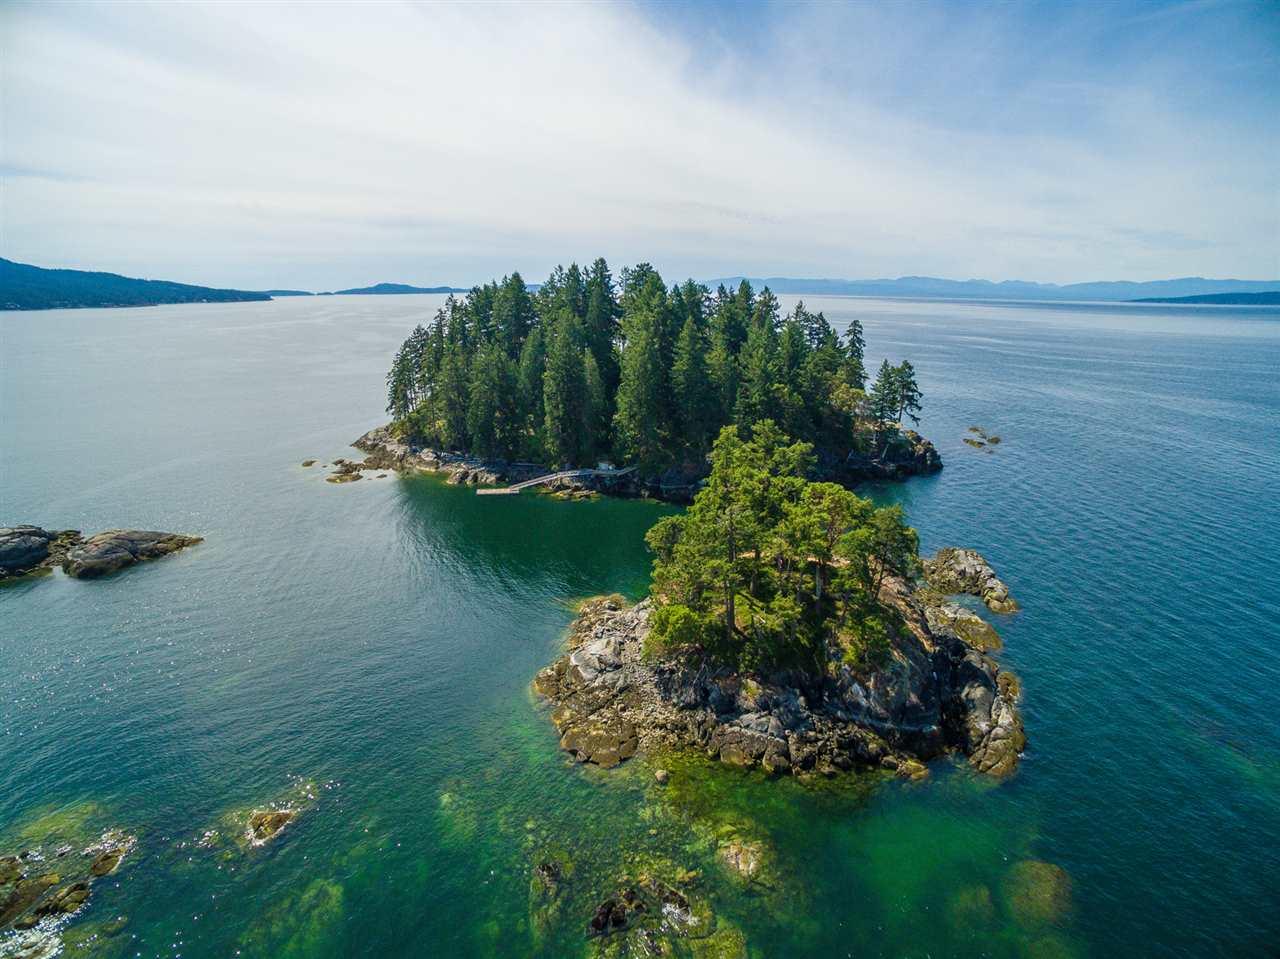 Recreational at 12401 WHITESTONE ROAD, Sunshine Coast, British Columbia. Image 19